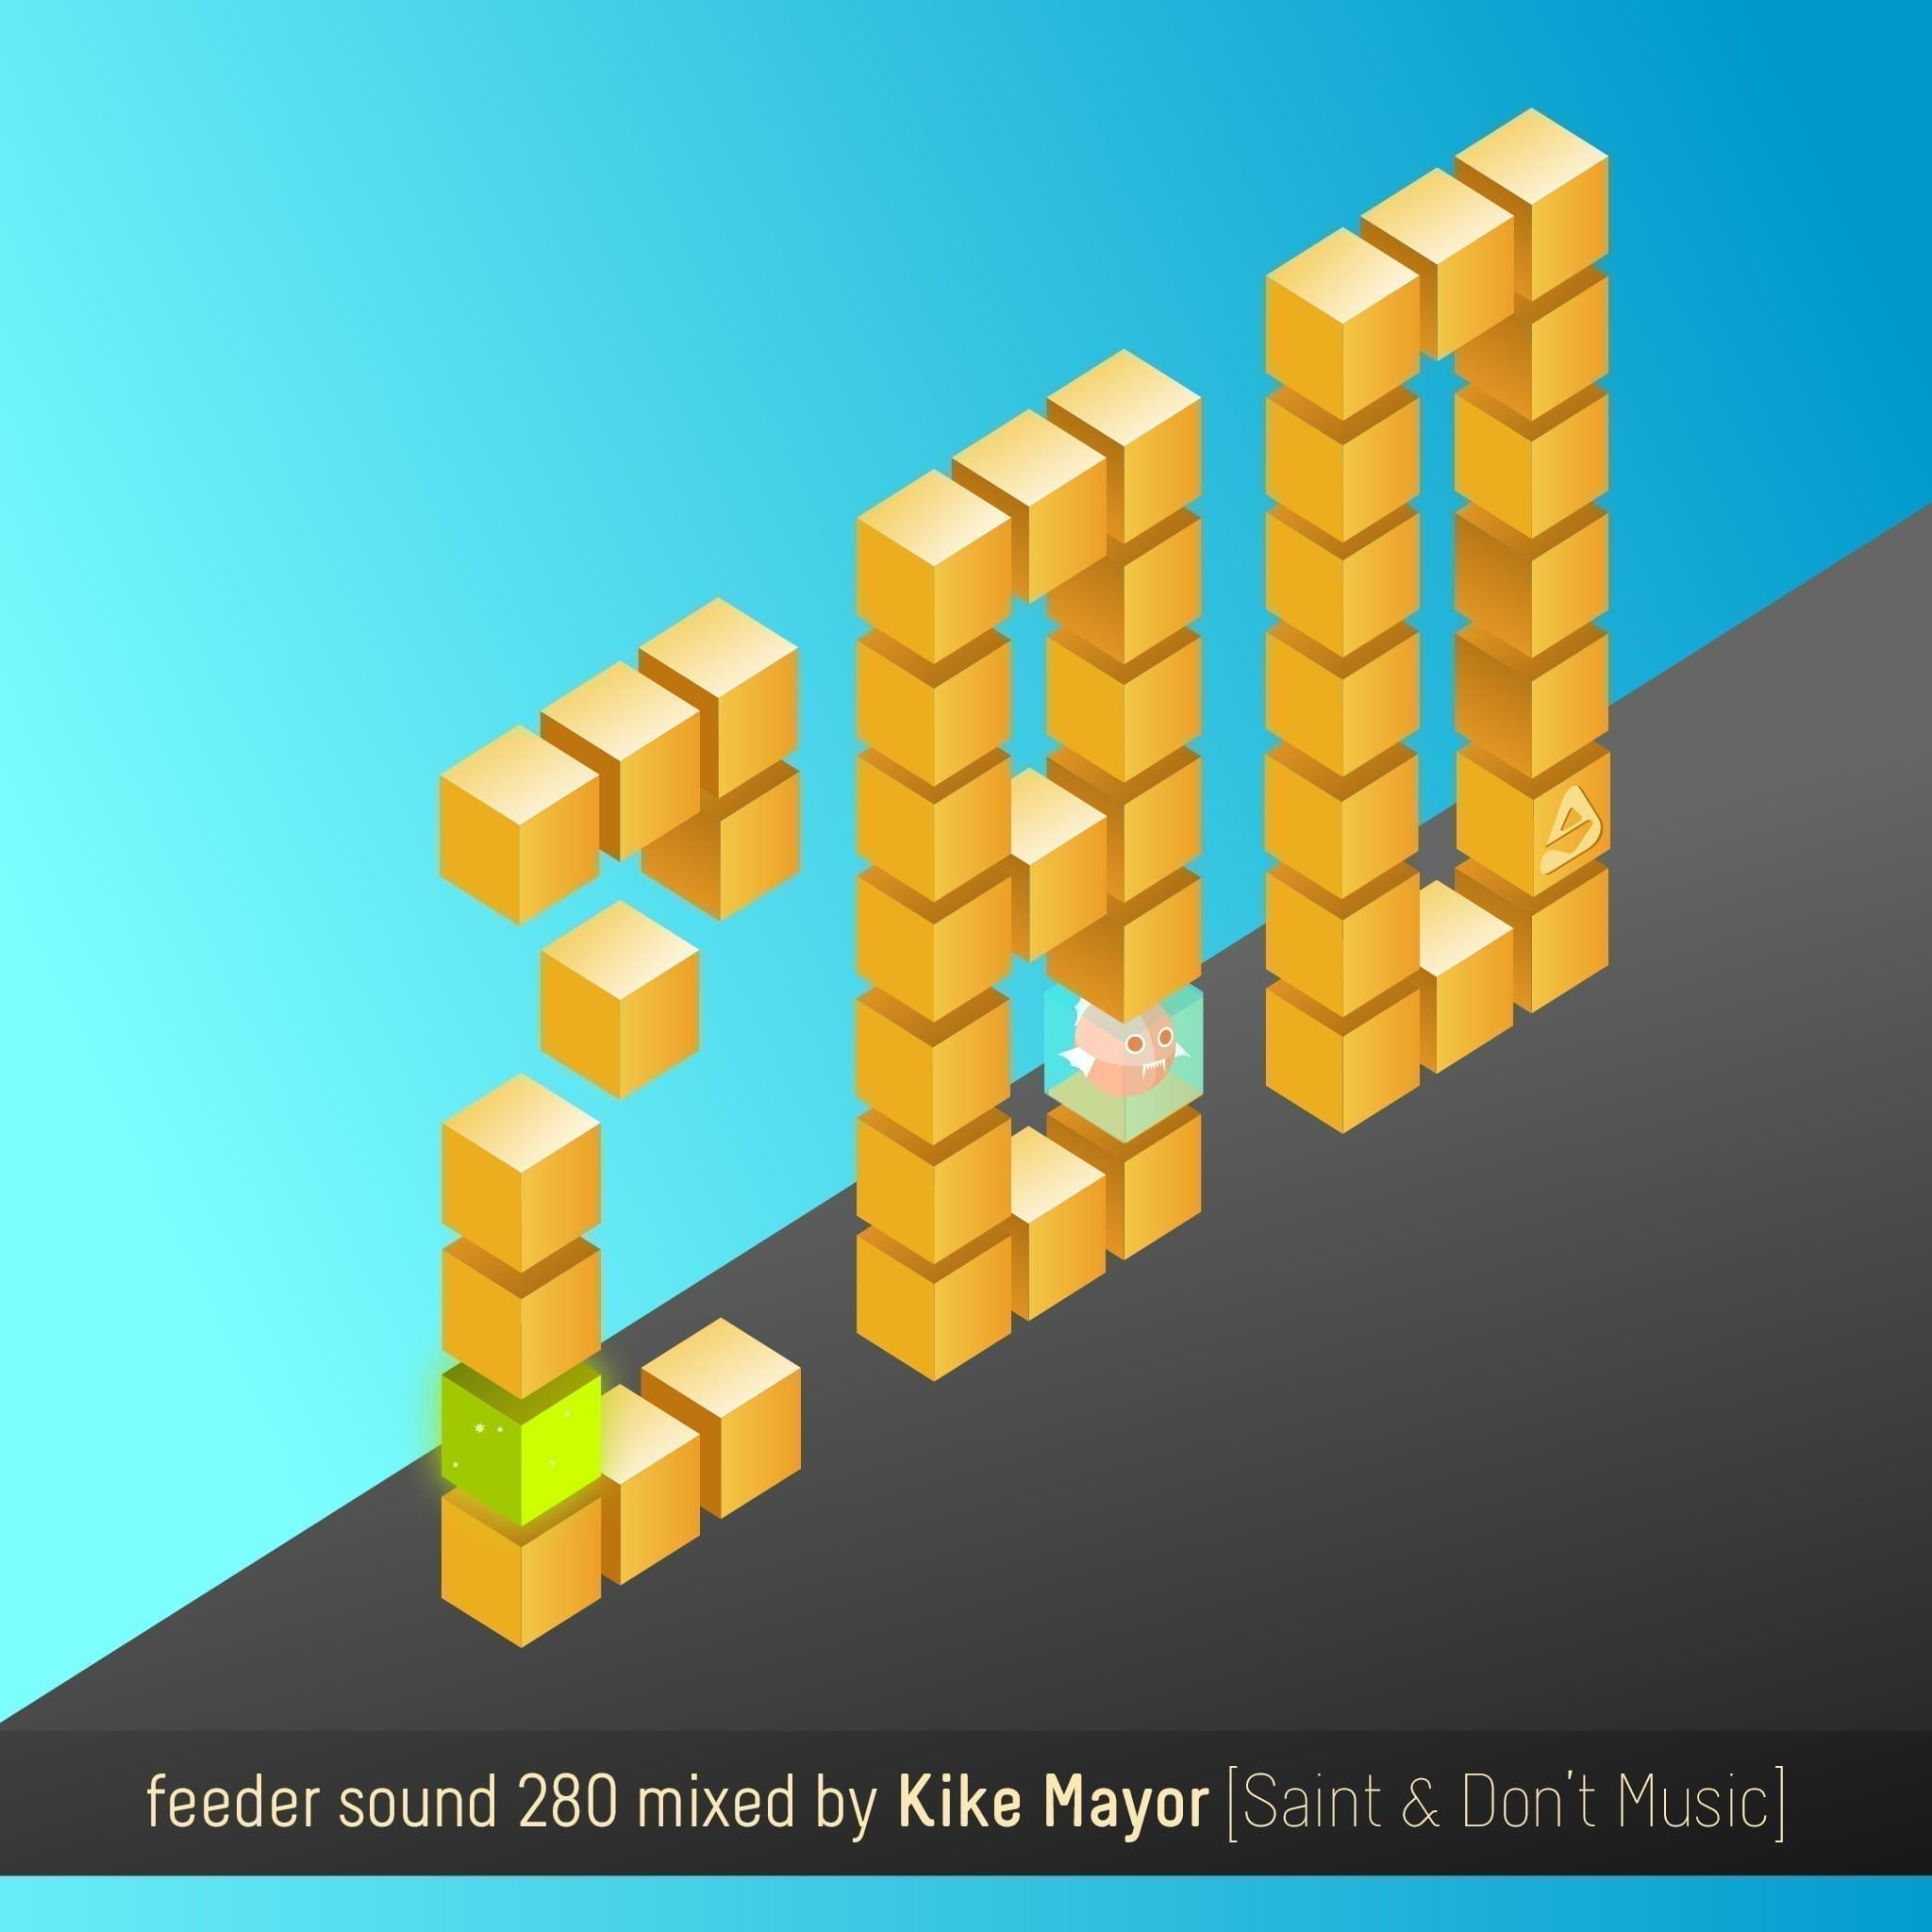 feeder sound 280 mixed by Kike Mayor [Saint & Don't Music] 01